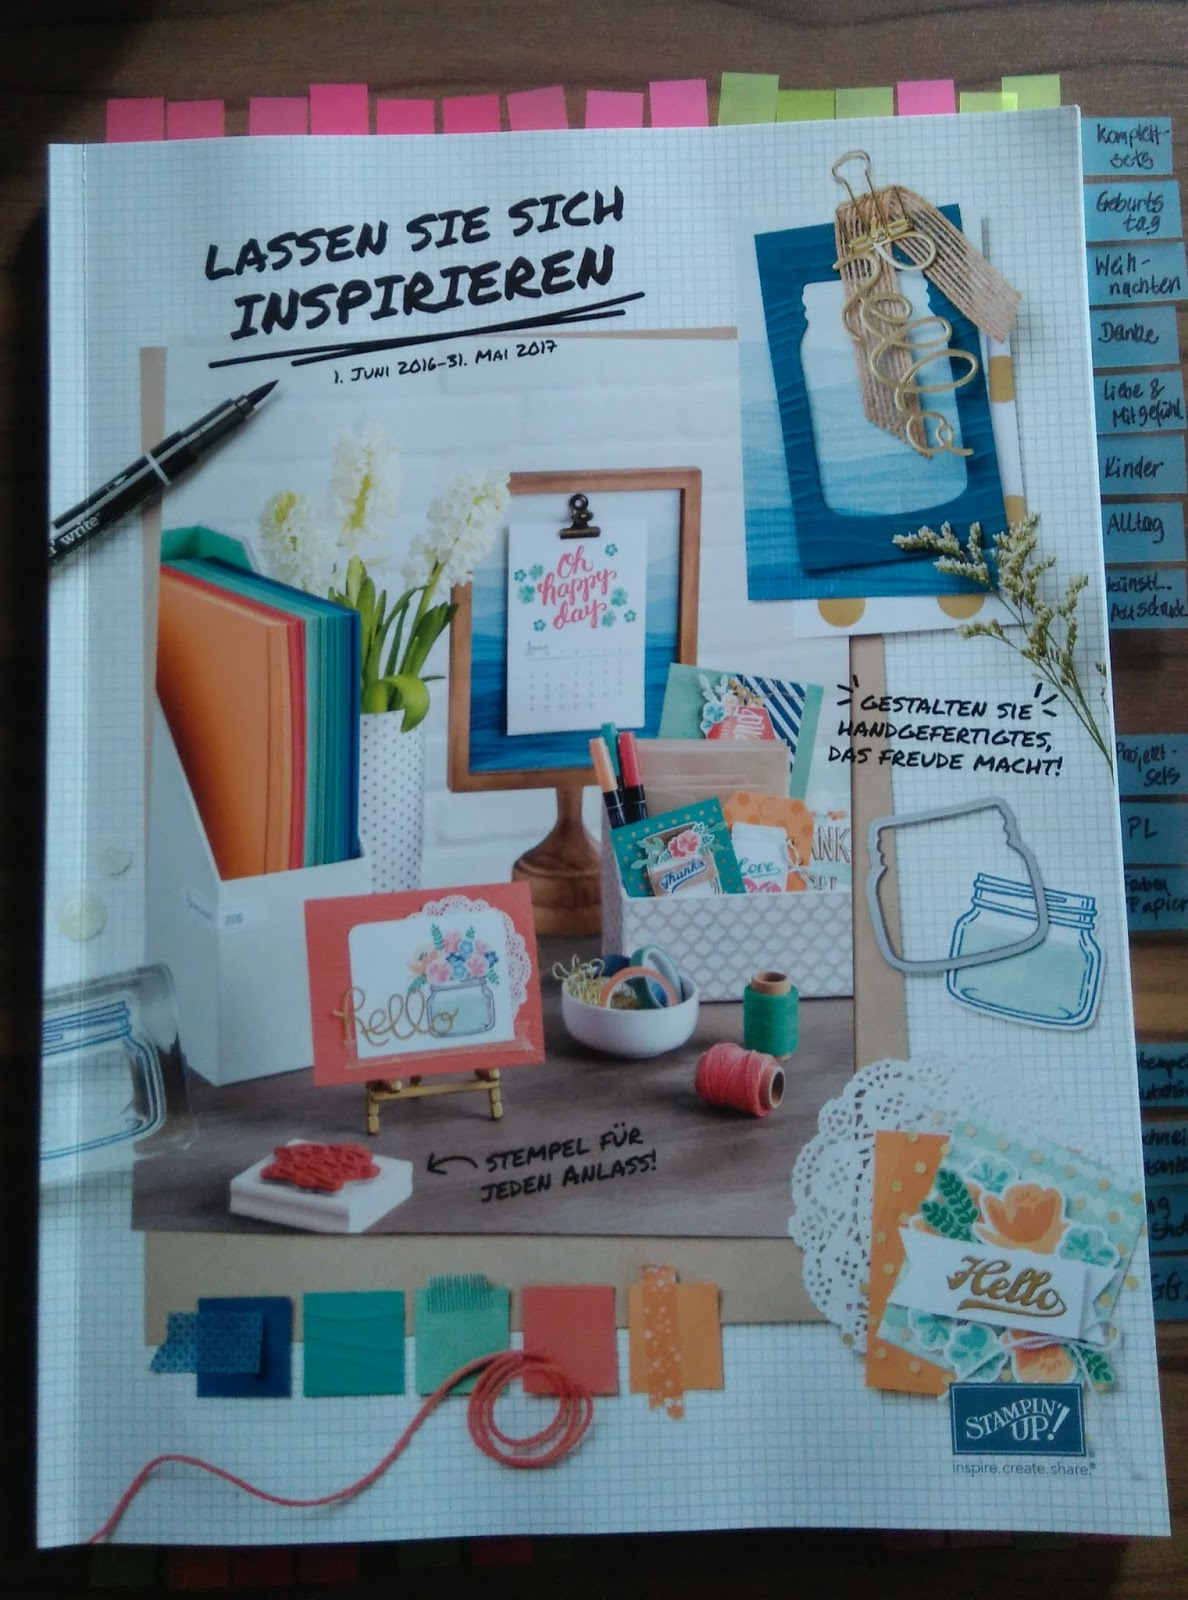 Jessikruemel neuer katalog 2016 2017 for Neuer weltbild katalog